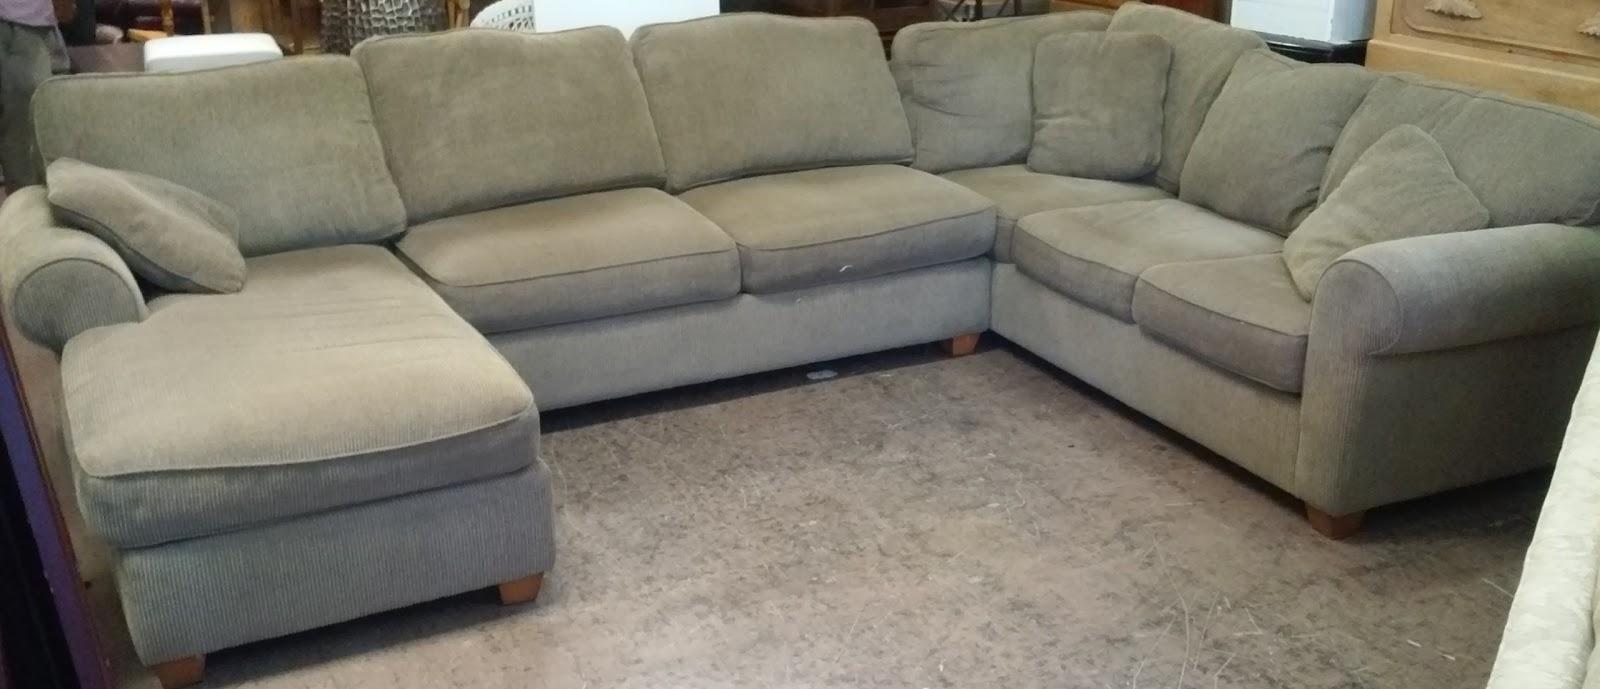 Awe Inspiring Uhuru Furniture Collectibles Sold Bauhaus 3 Piece Uwap Interior Chair Design Uwaporg